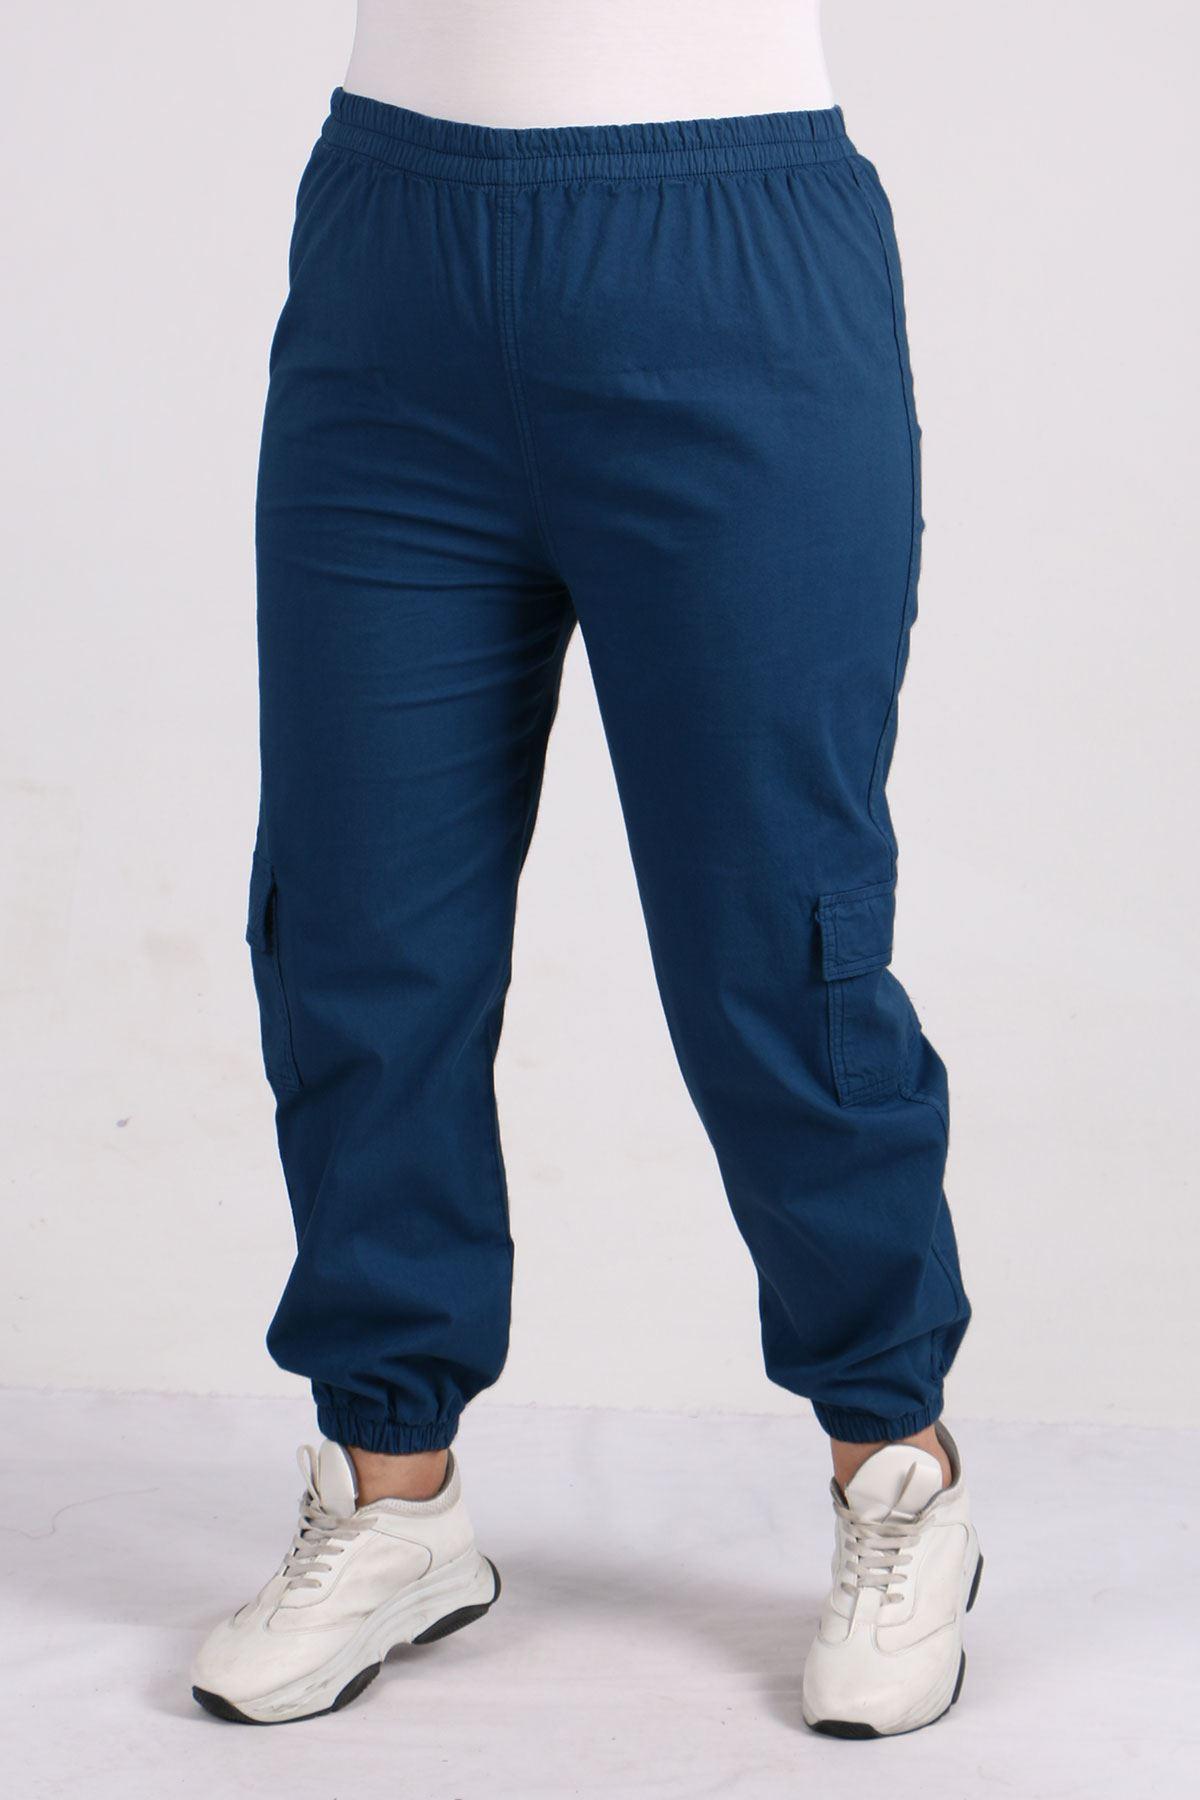 9140 Plus Size Cargo Pants with Pockets - Indigo